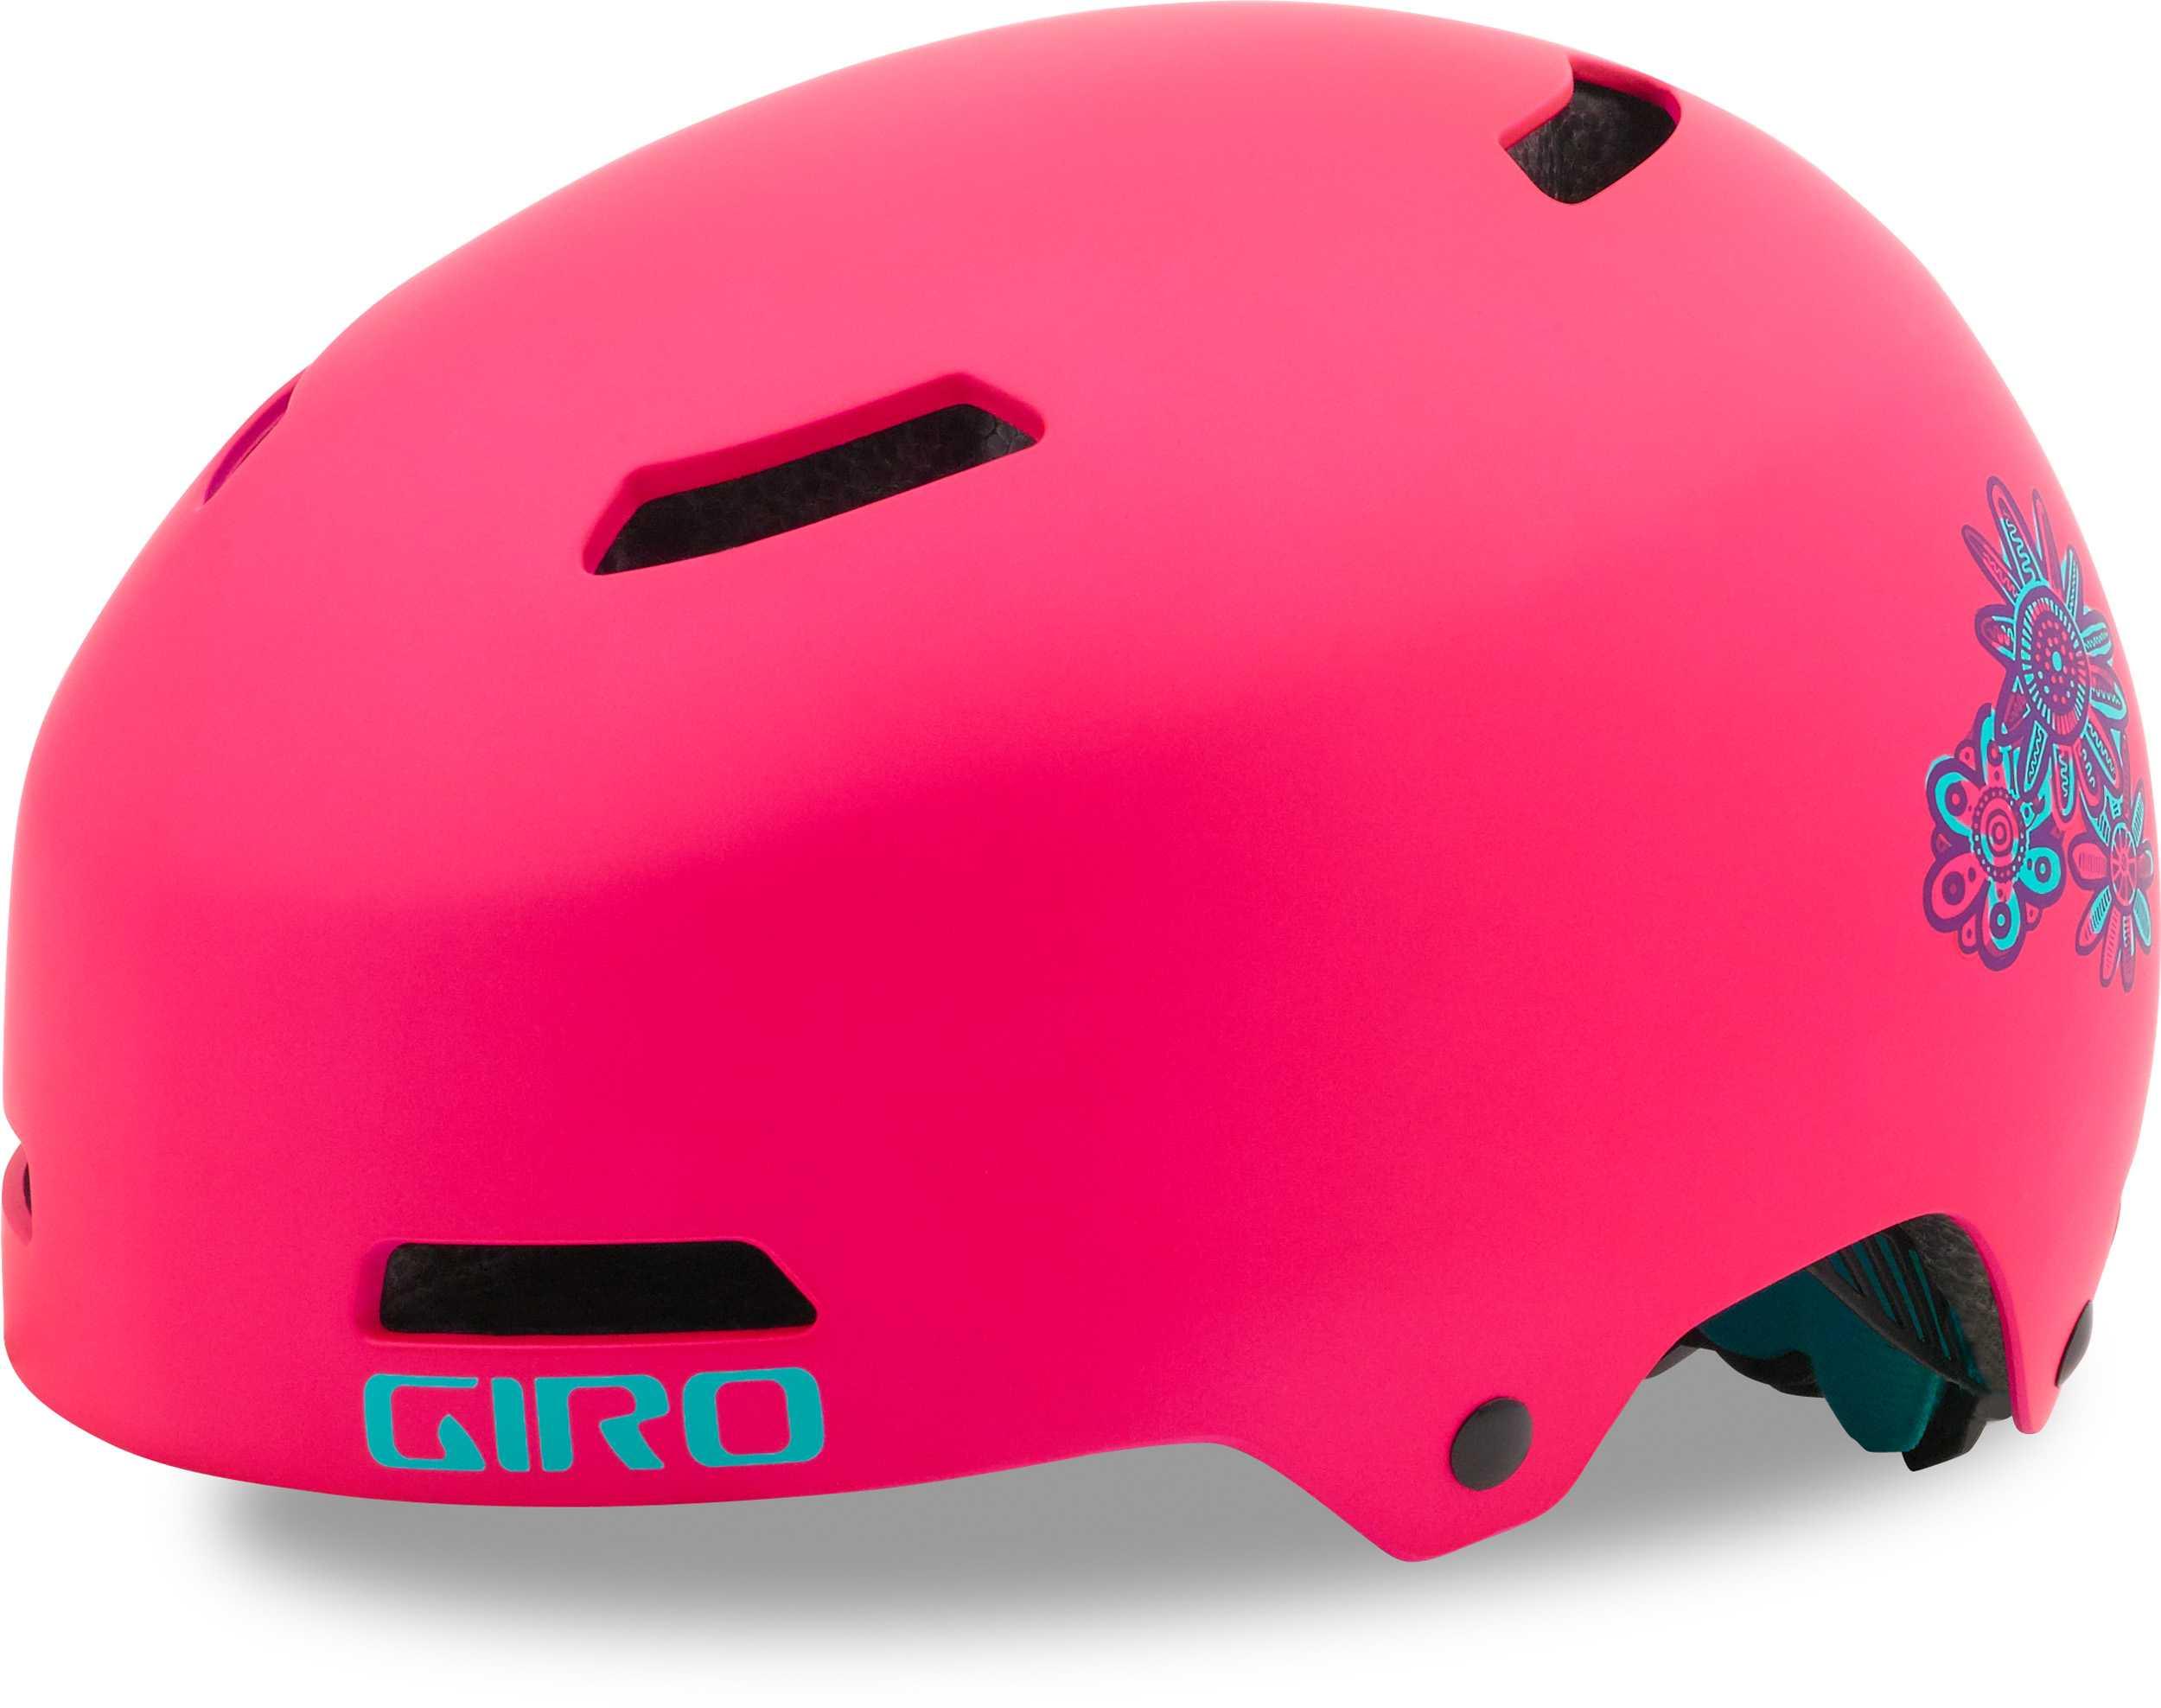 Giro Dime FS - Cykelhjelm - Str. 51-55 cm - Mat Sort   Helmets